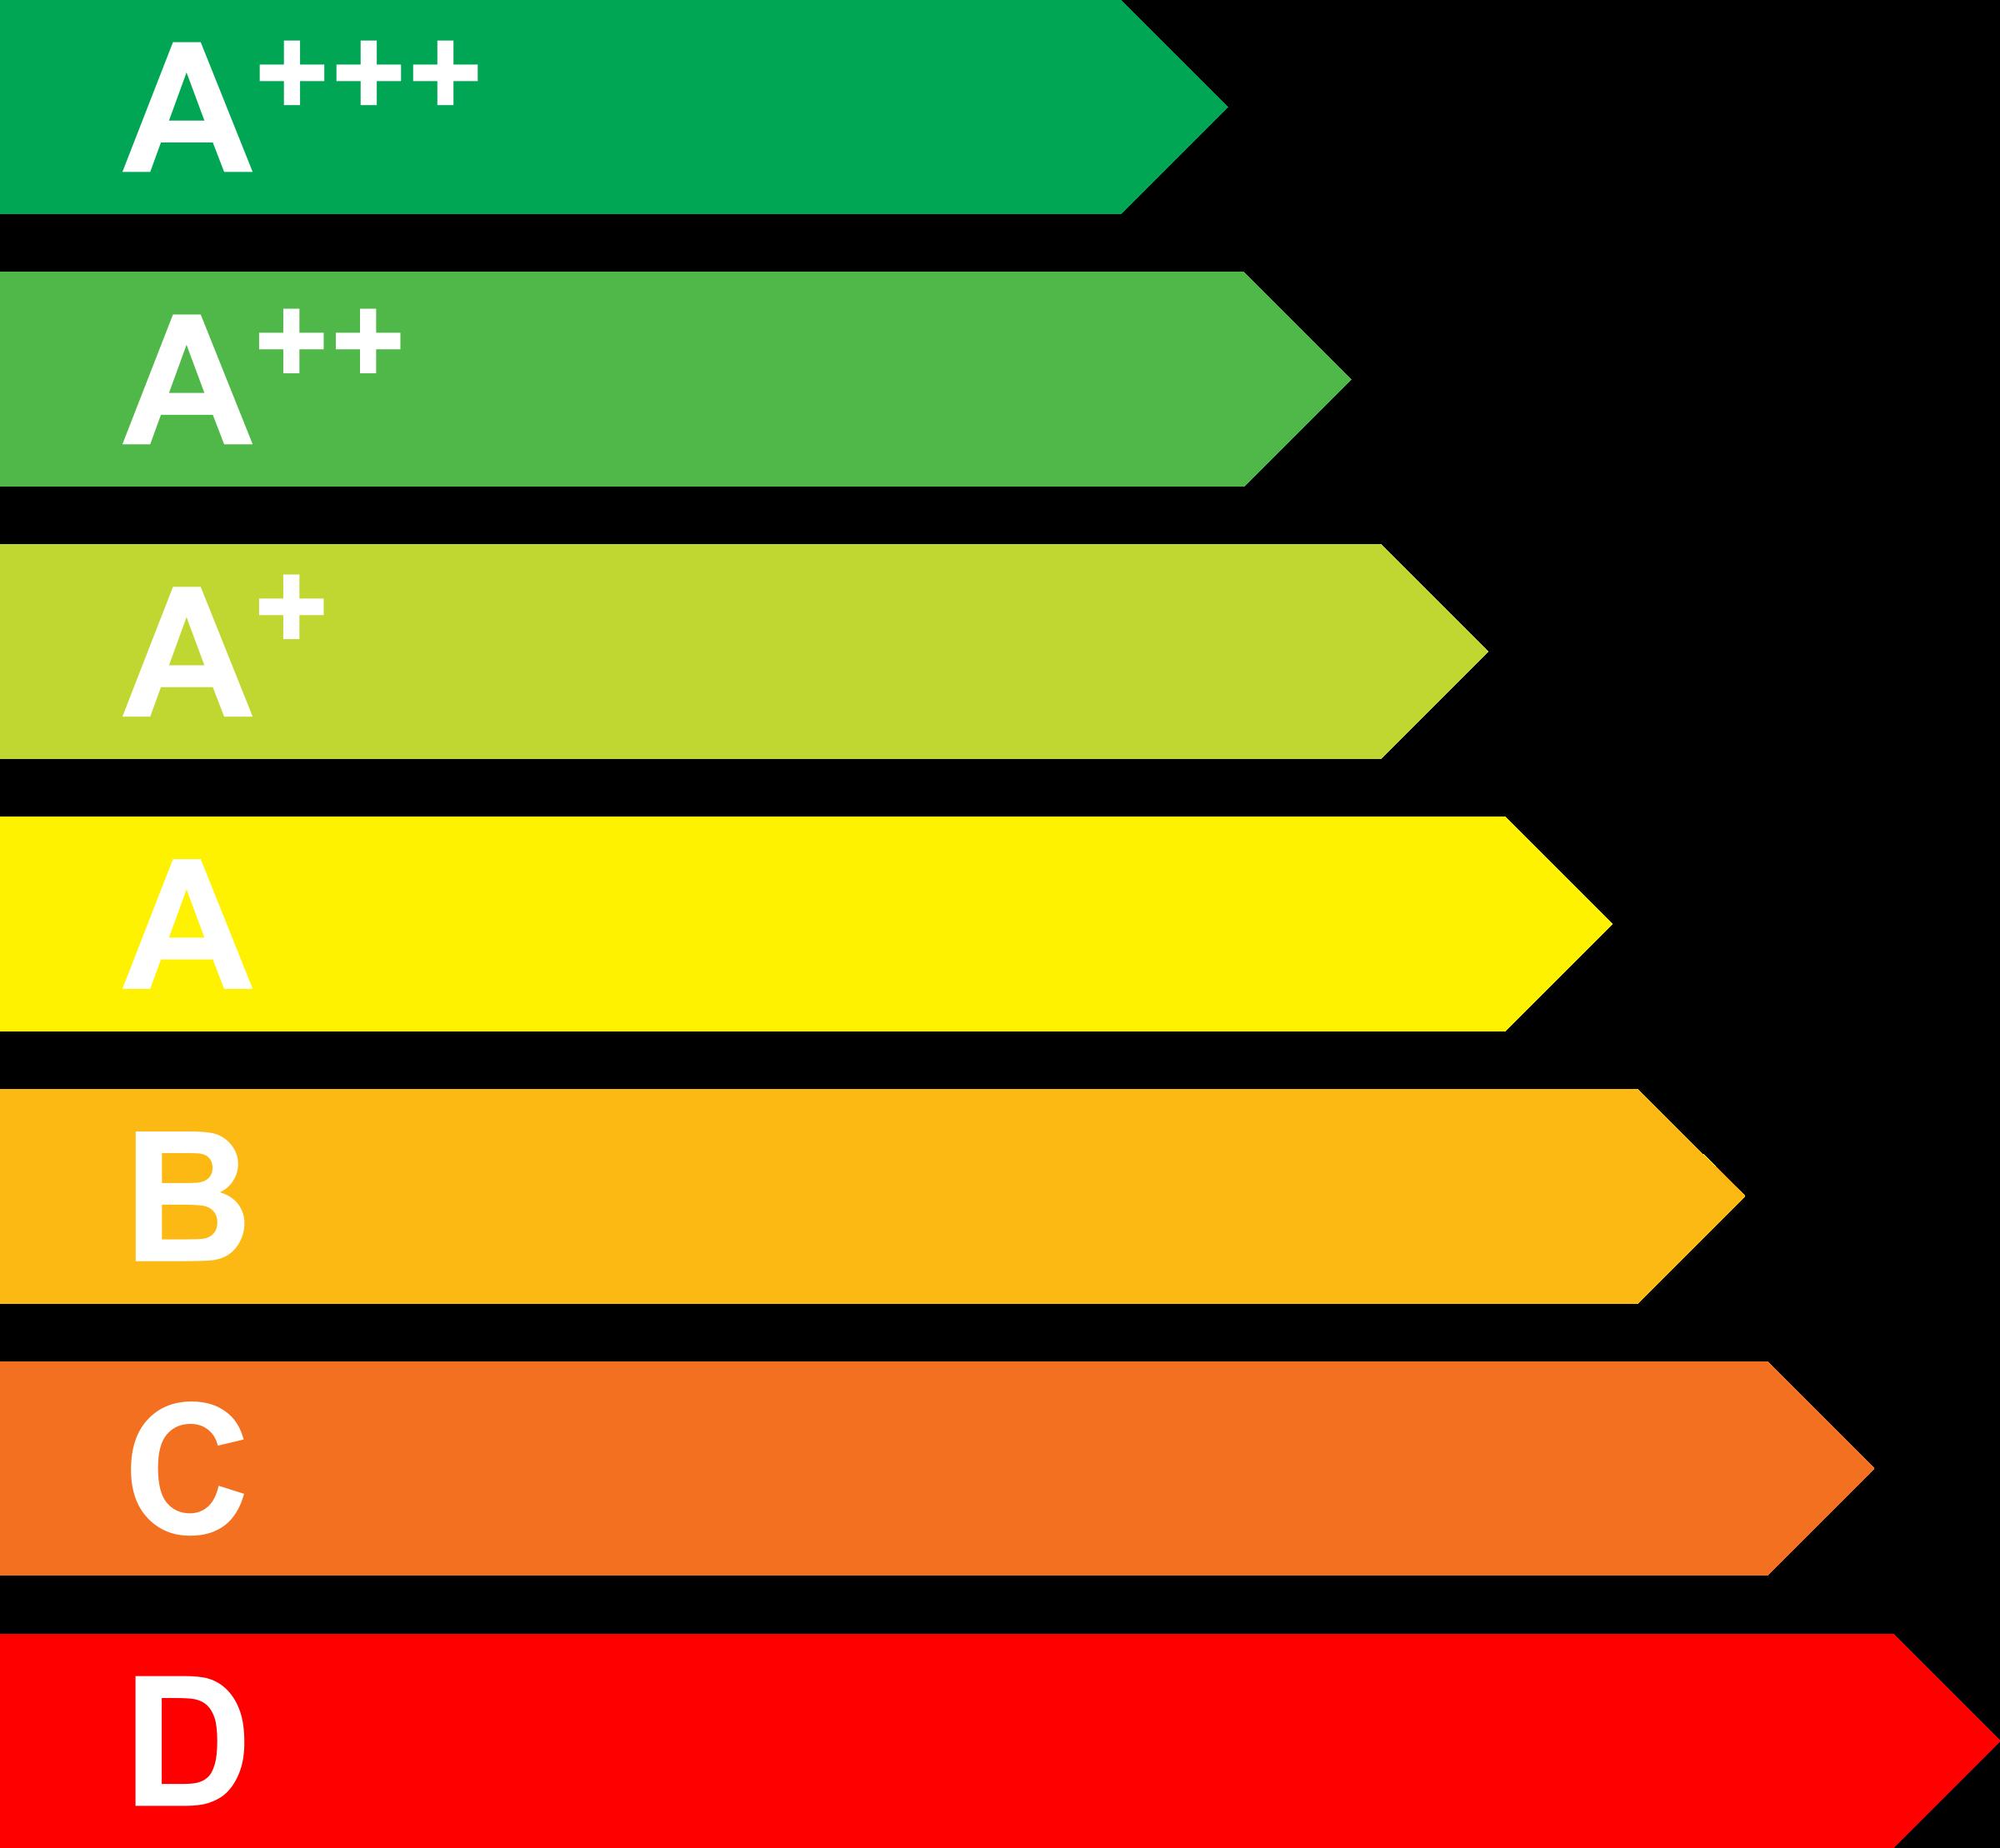 Clipart classe energetica for Classe energetica